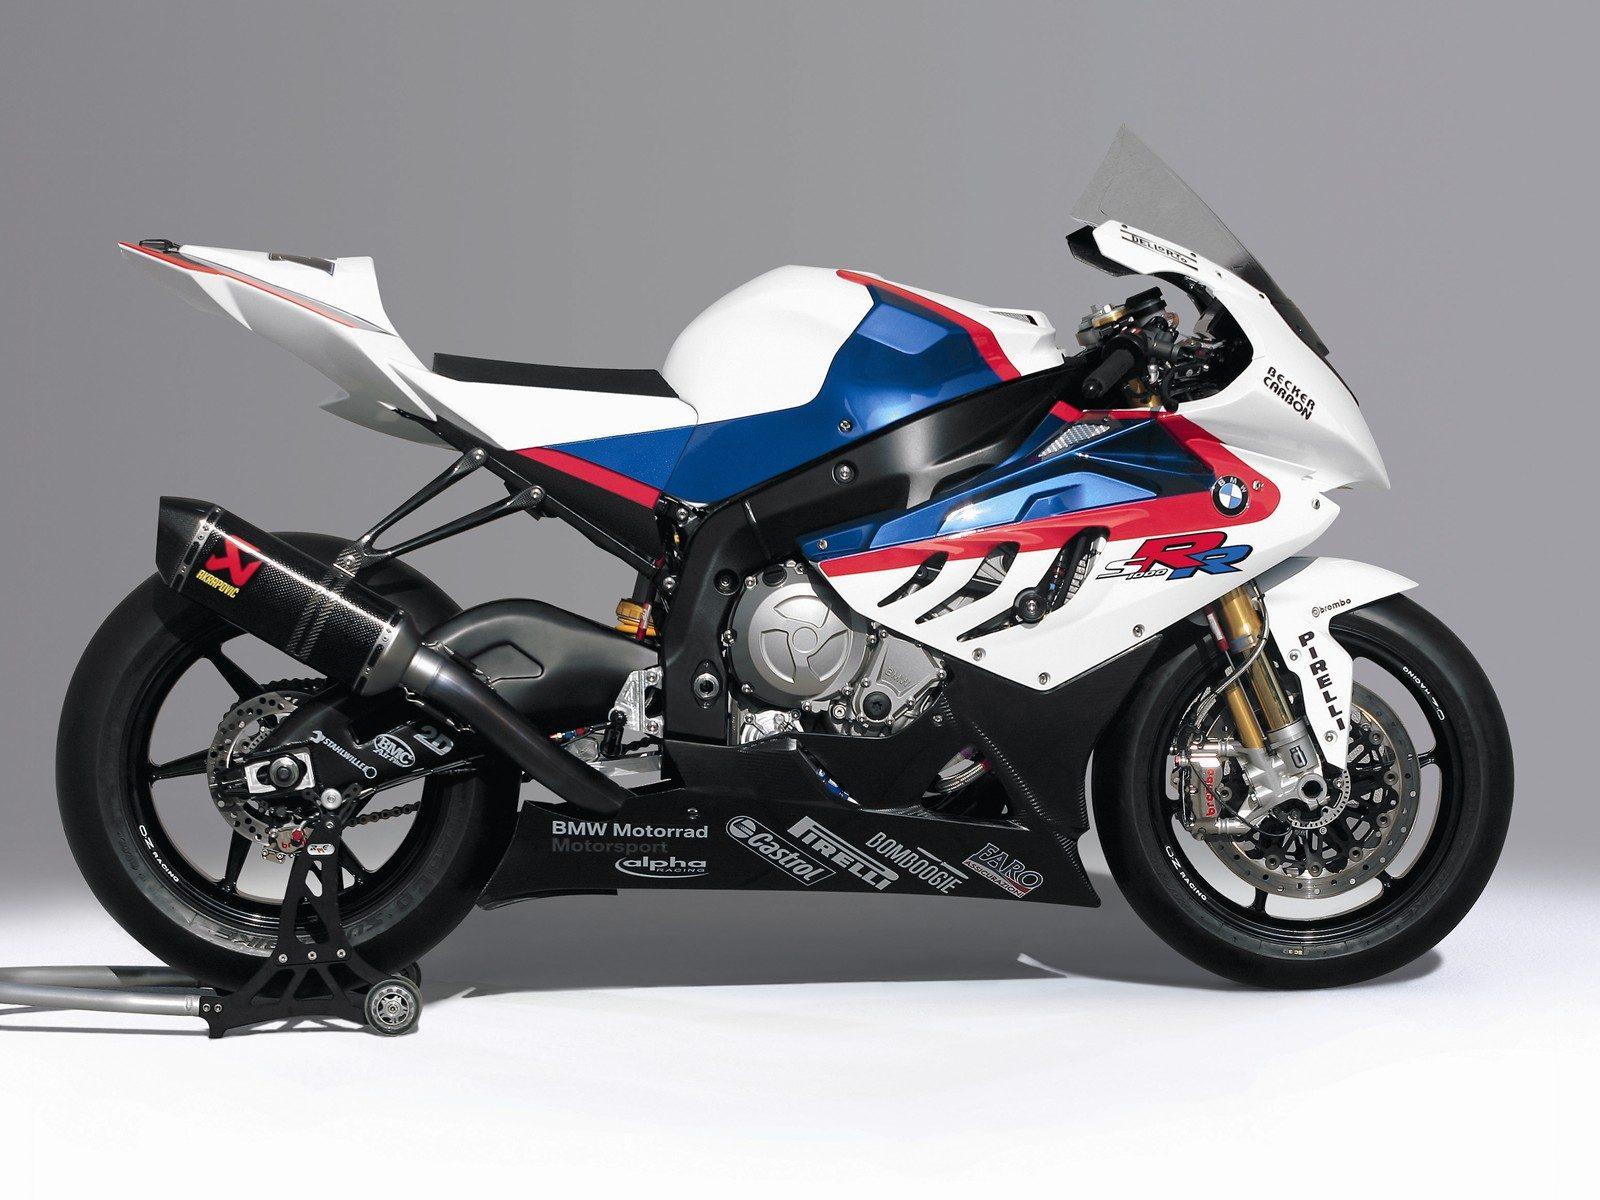 Bmw sport bike rr